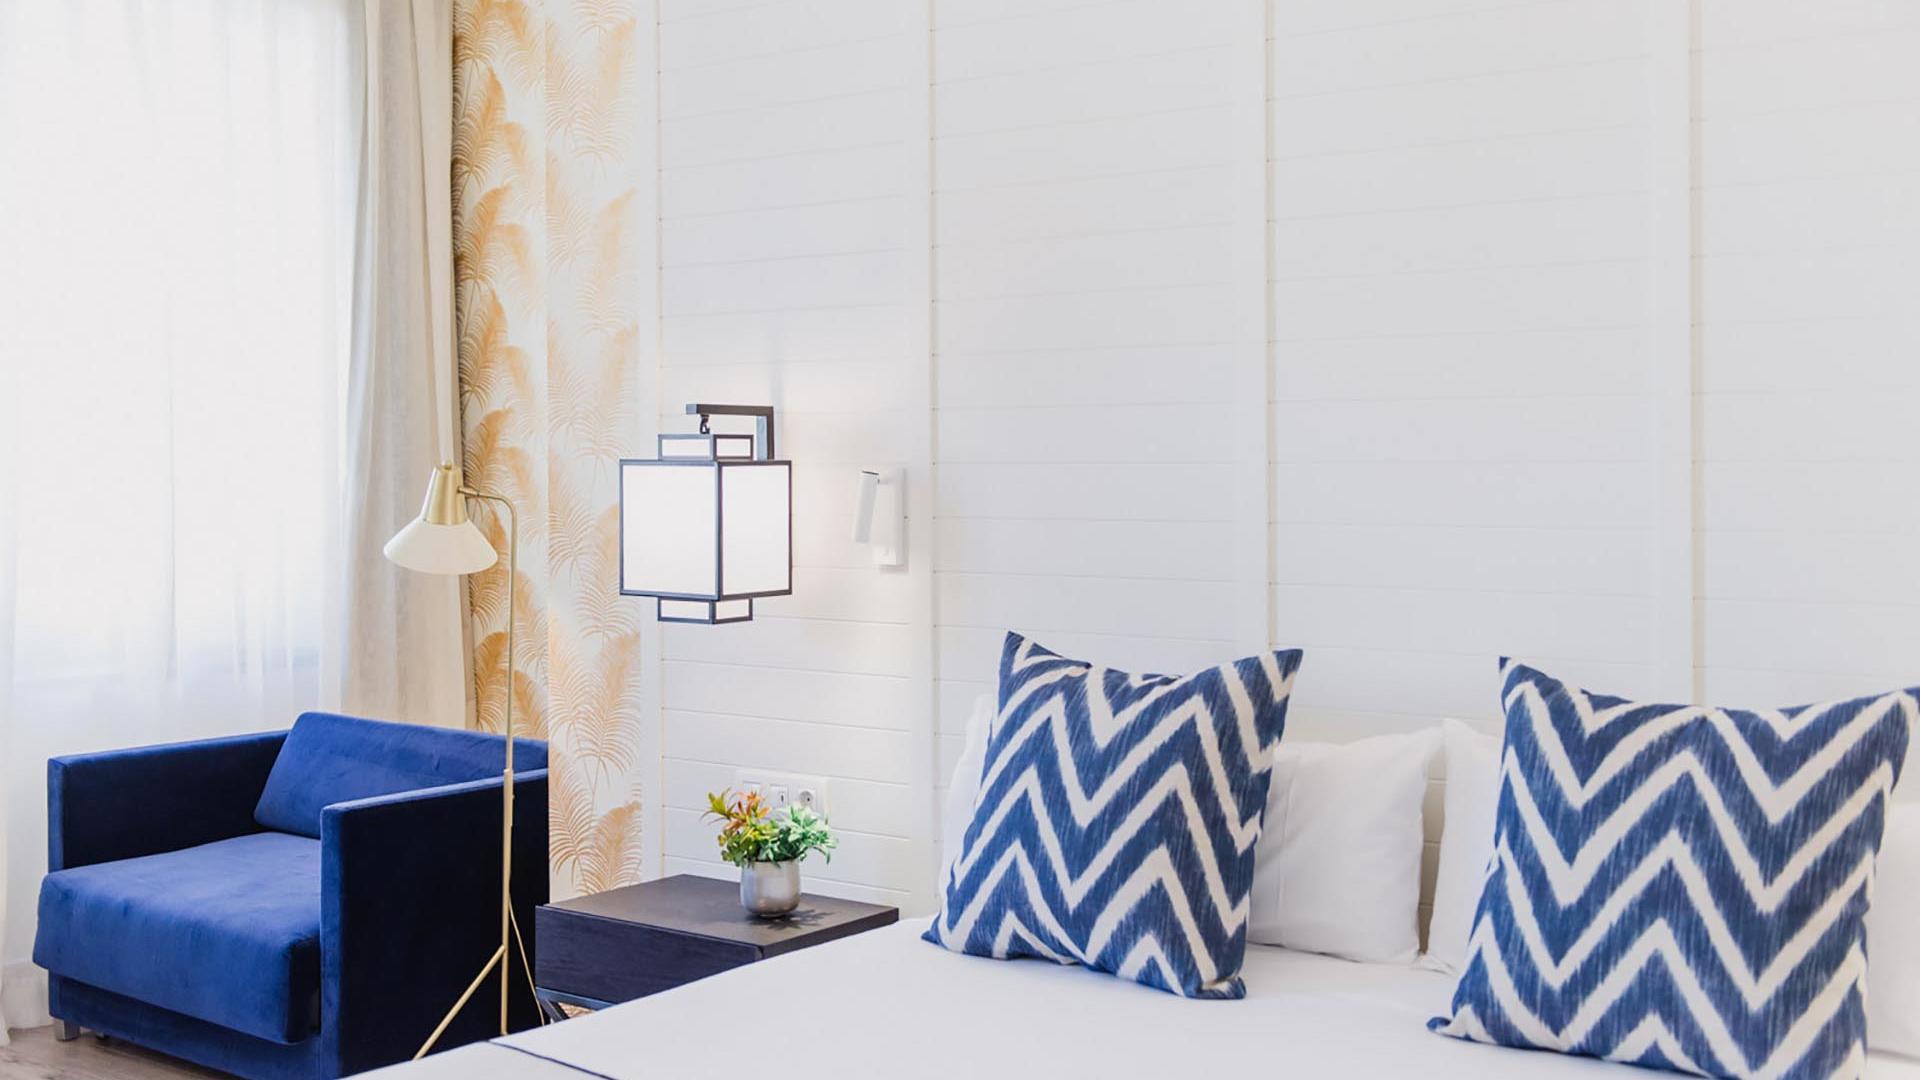 Hotel Molina Lario Deluxe Room Bed